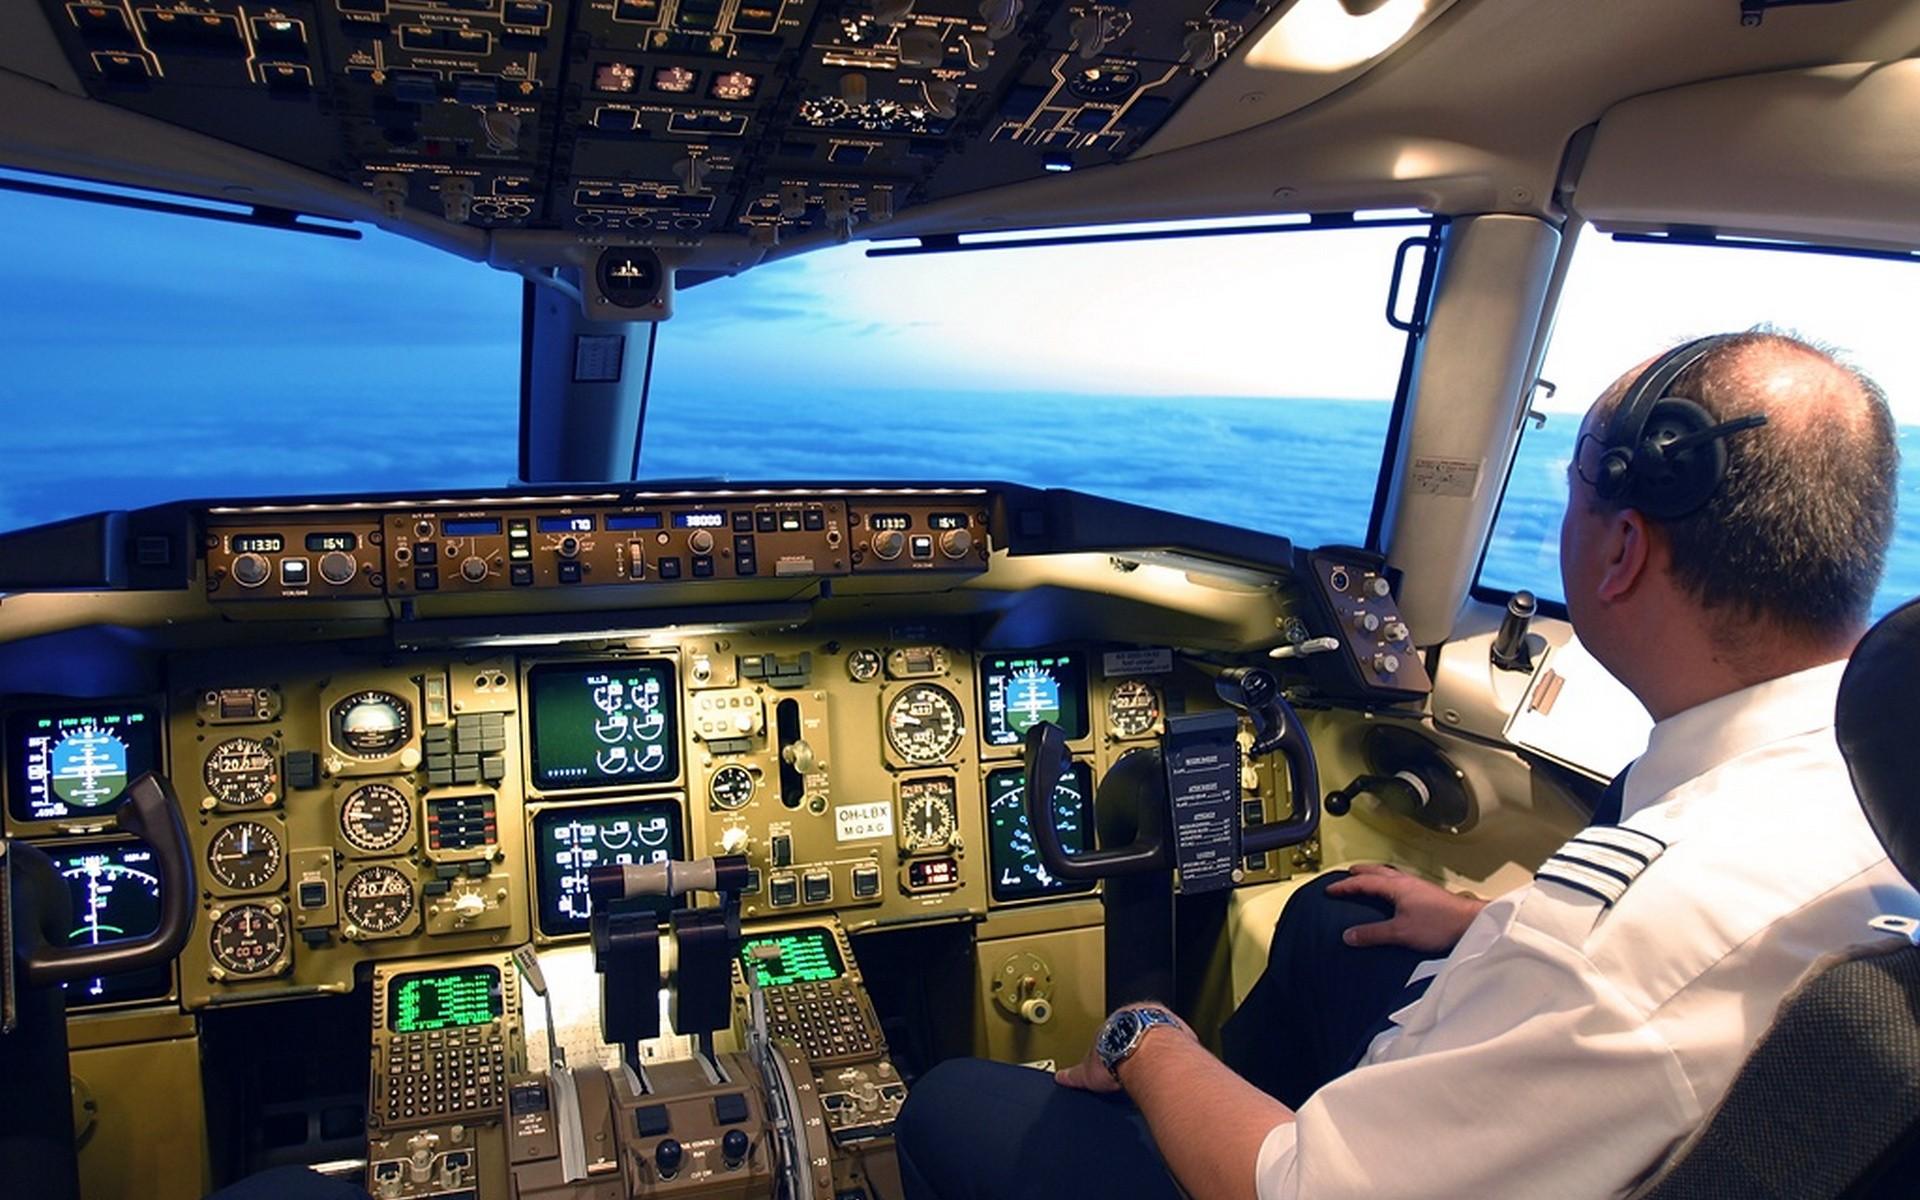 Wallpaper Clouds Airplane Pilot Person Cockpit Air